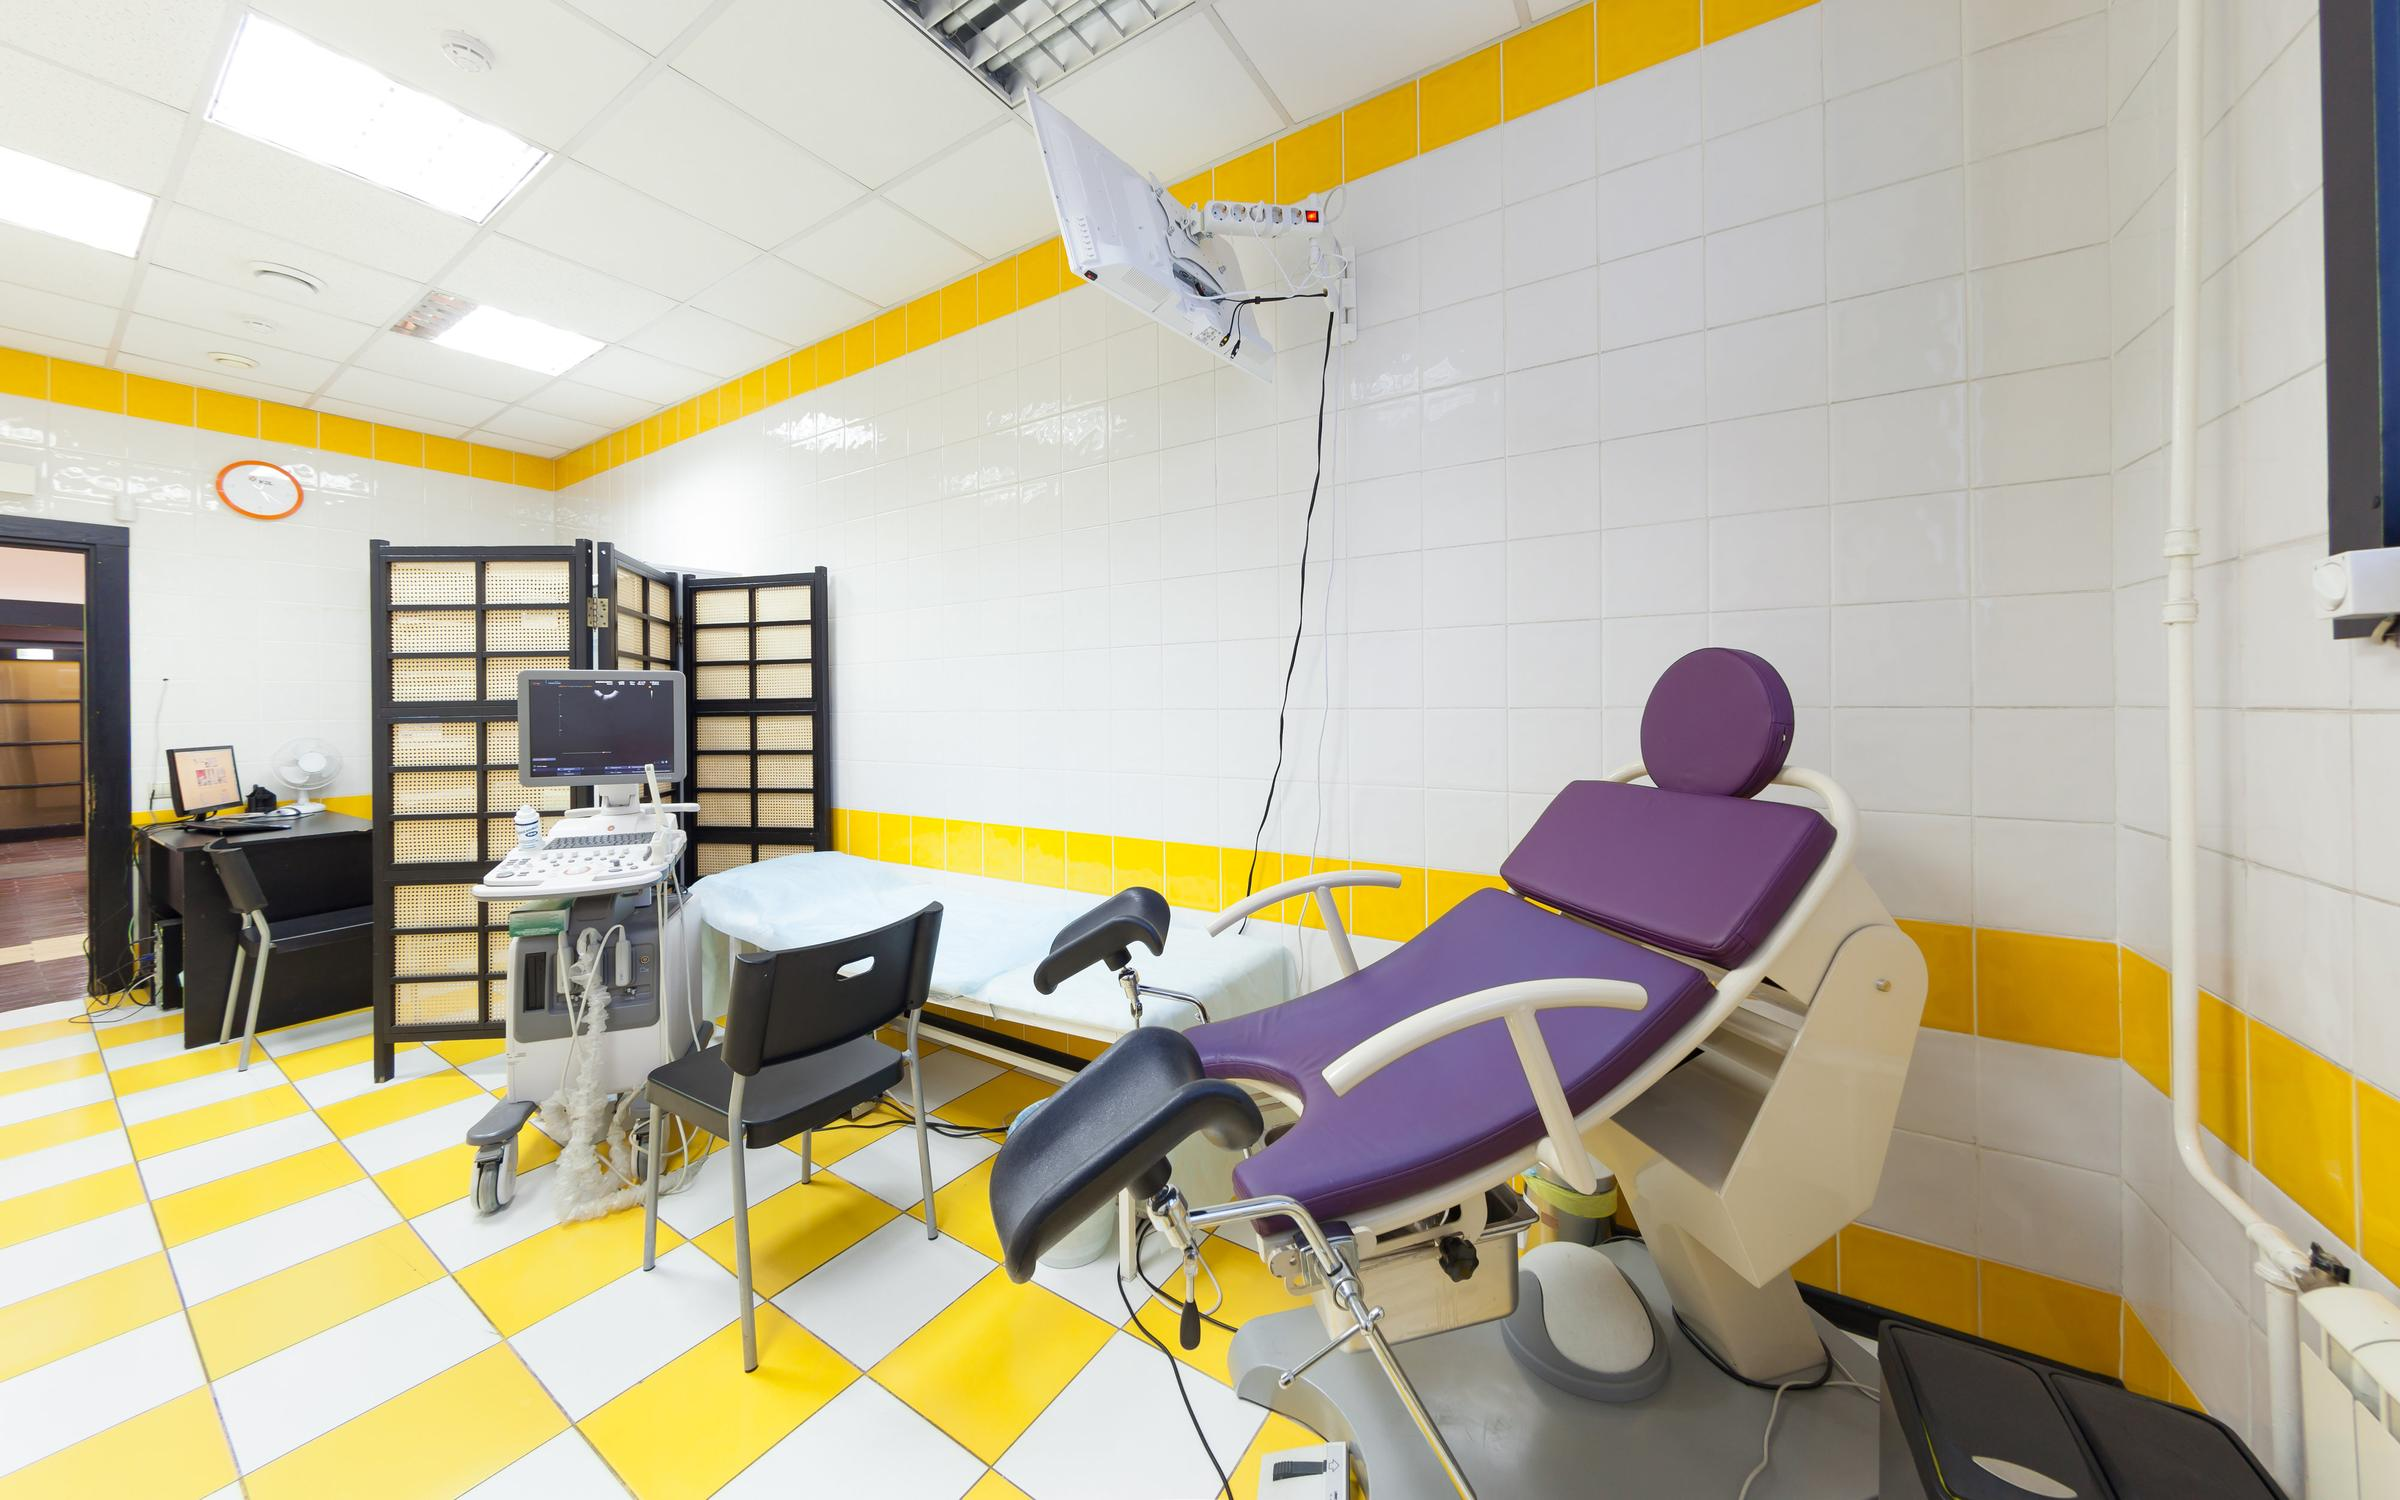 фотография Медицинского центра МедлайН-Сервис на Ярославском шоссе